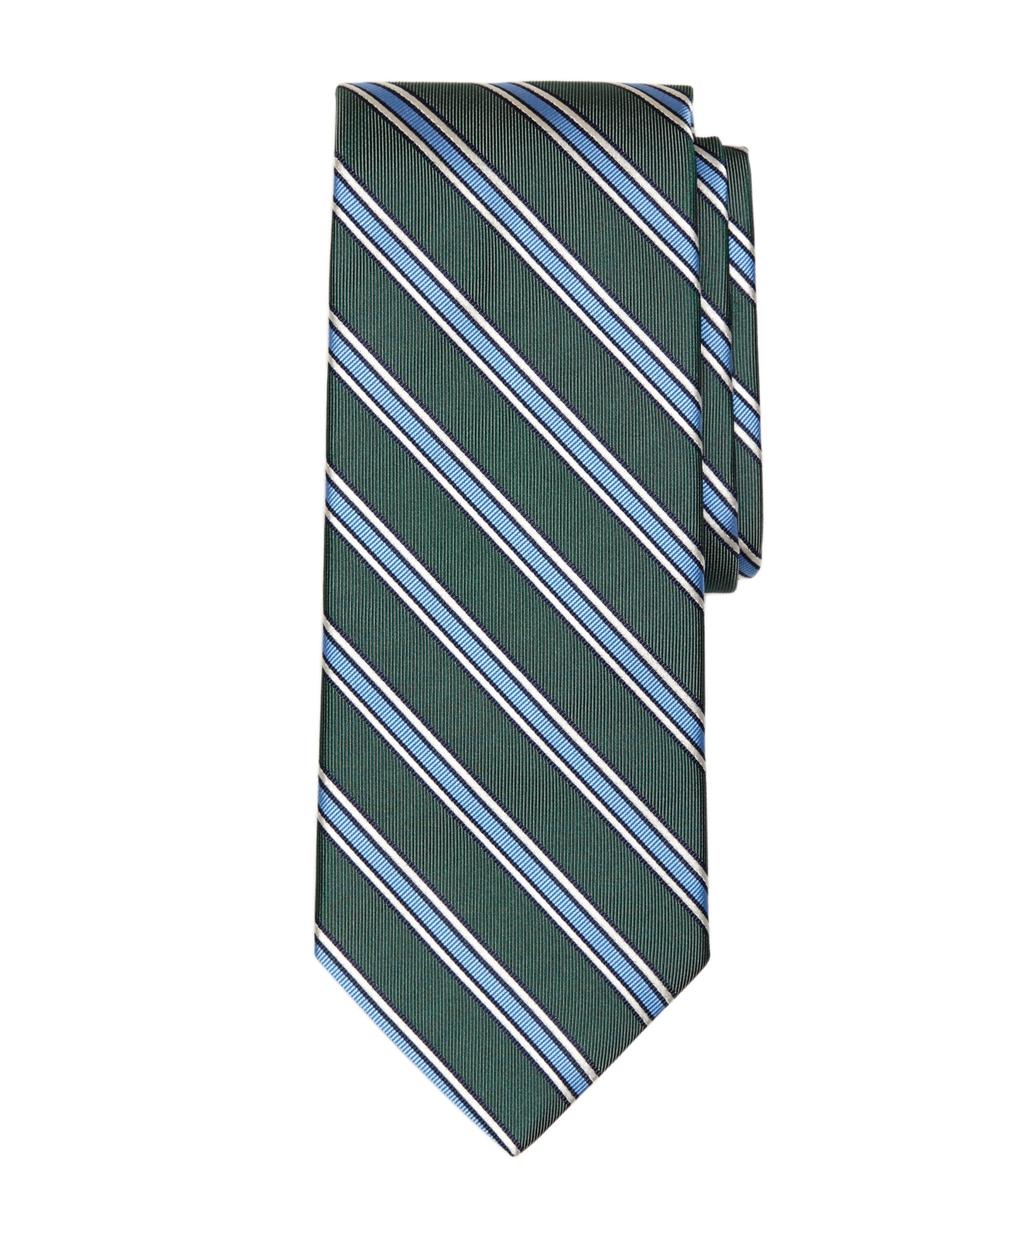 Lyst - Brooks brothers Framed Stripe Tie in Green for Men